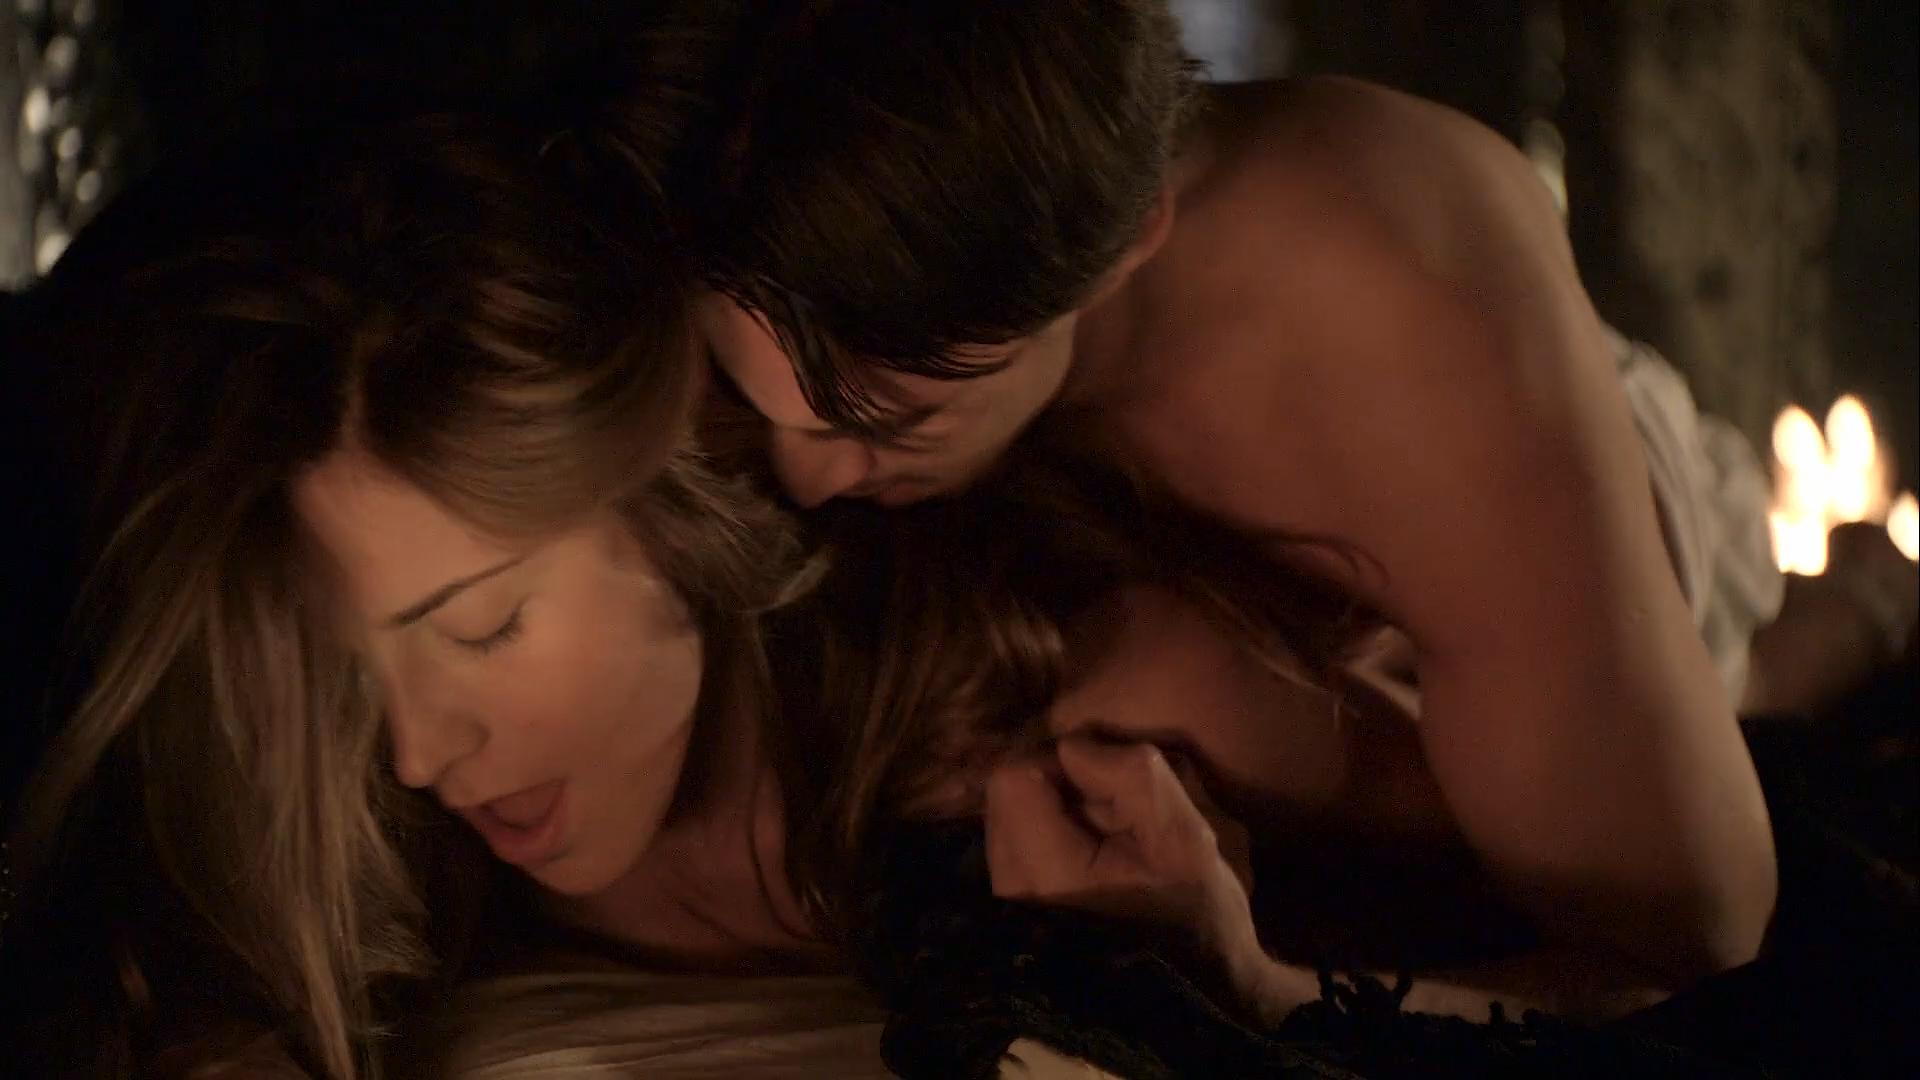 Ruta gedmintas nude sex scene in the tudors series on scandalplanetcom